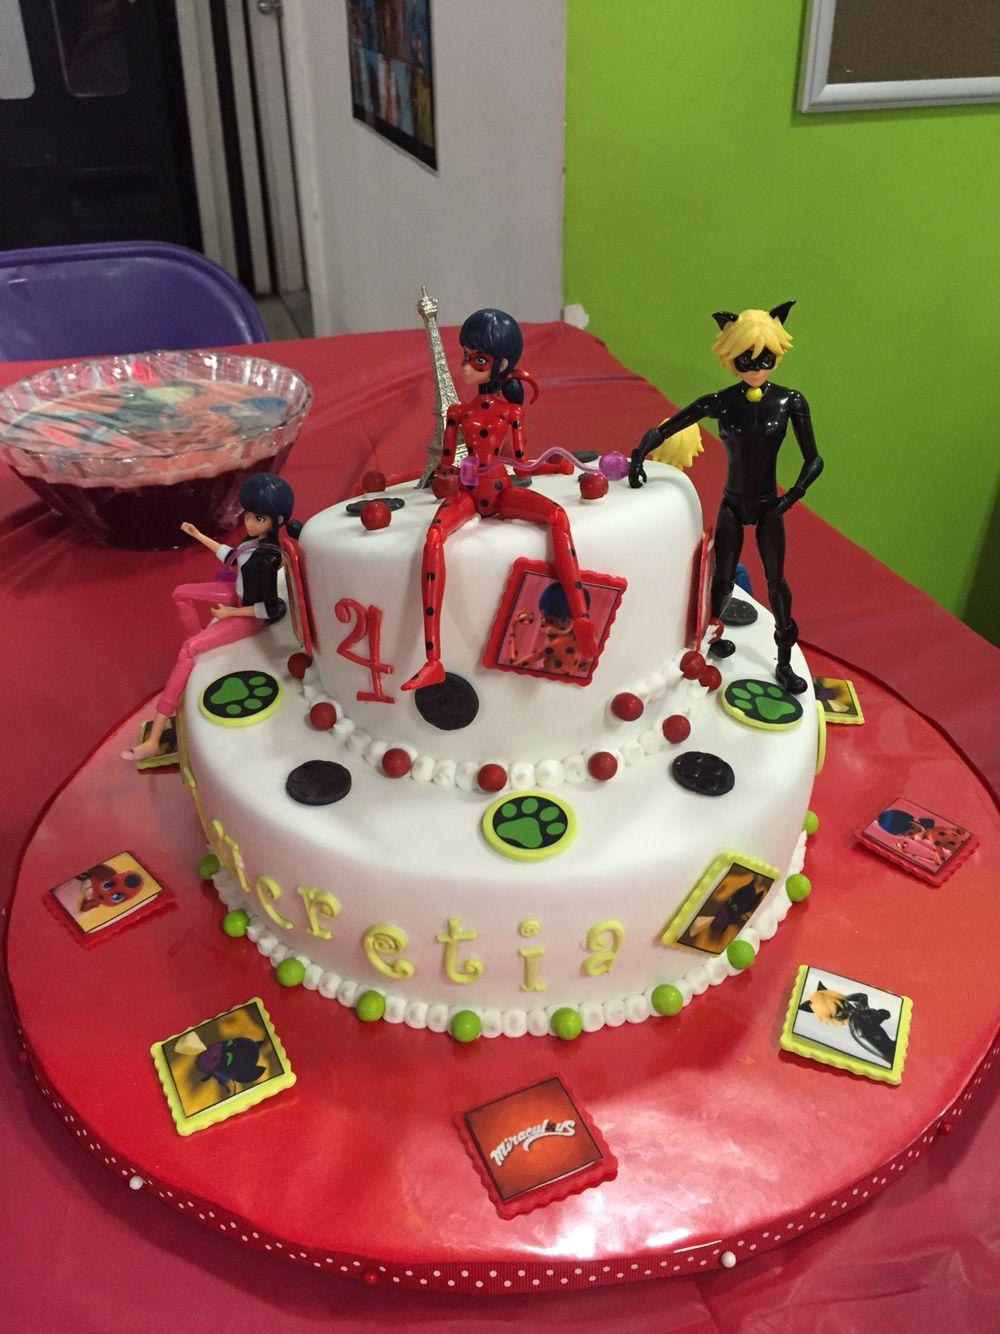 miraculous ladybug birthday cake f te d 39 anniversaire pinterest g teaux originaux. Black Bedroom Furniture Sets. Home Design Ideas